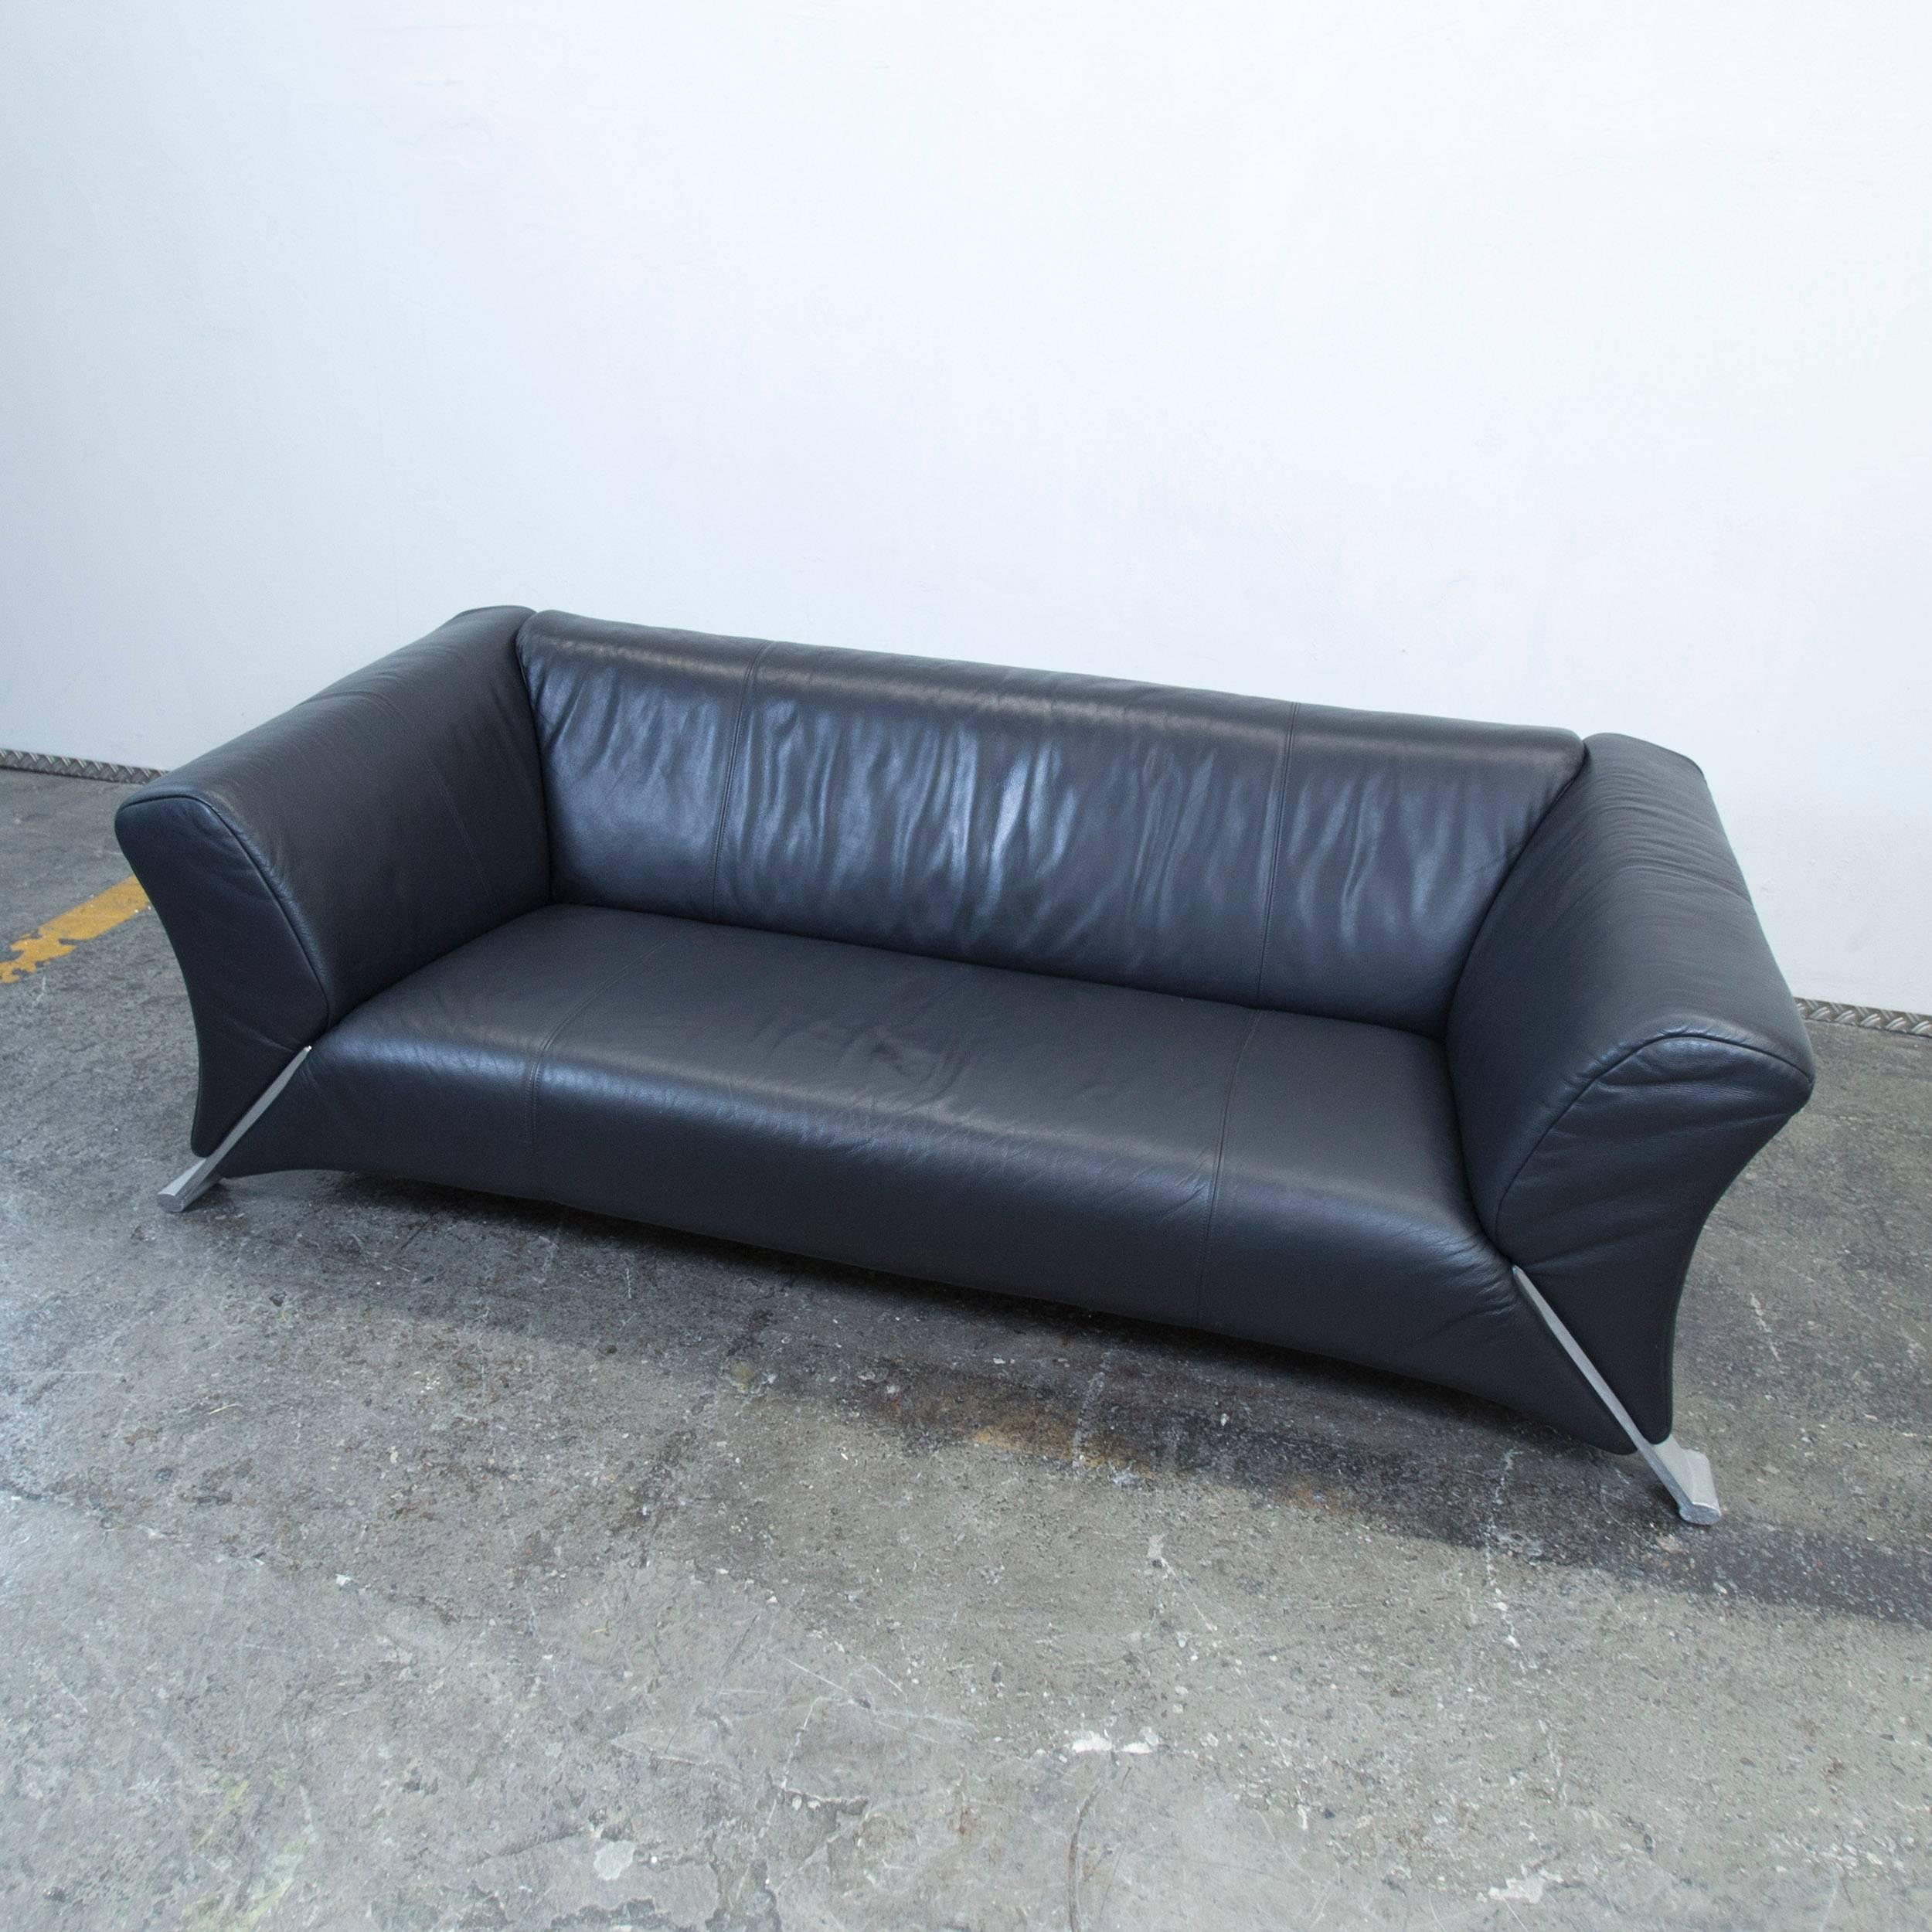 Rolf Benz 322 Designer Leather Sofa Black Three-Seat Couch ...